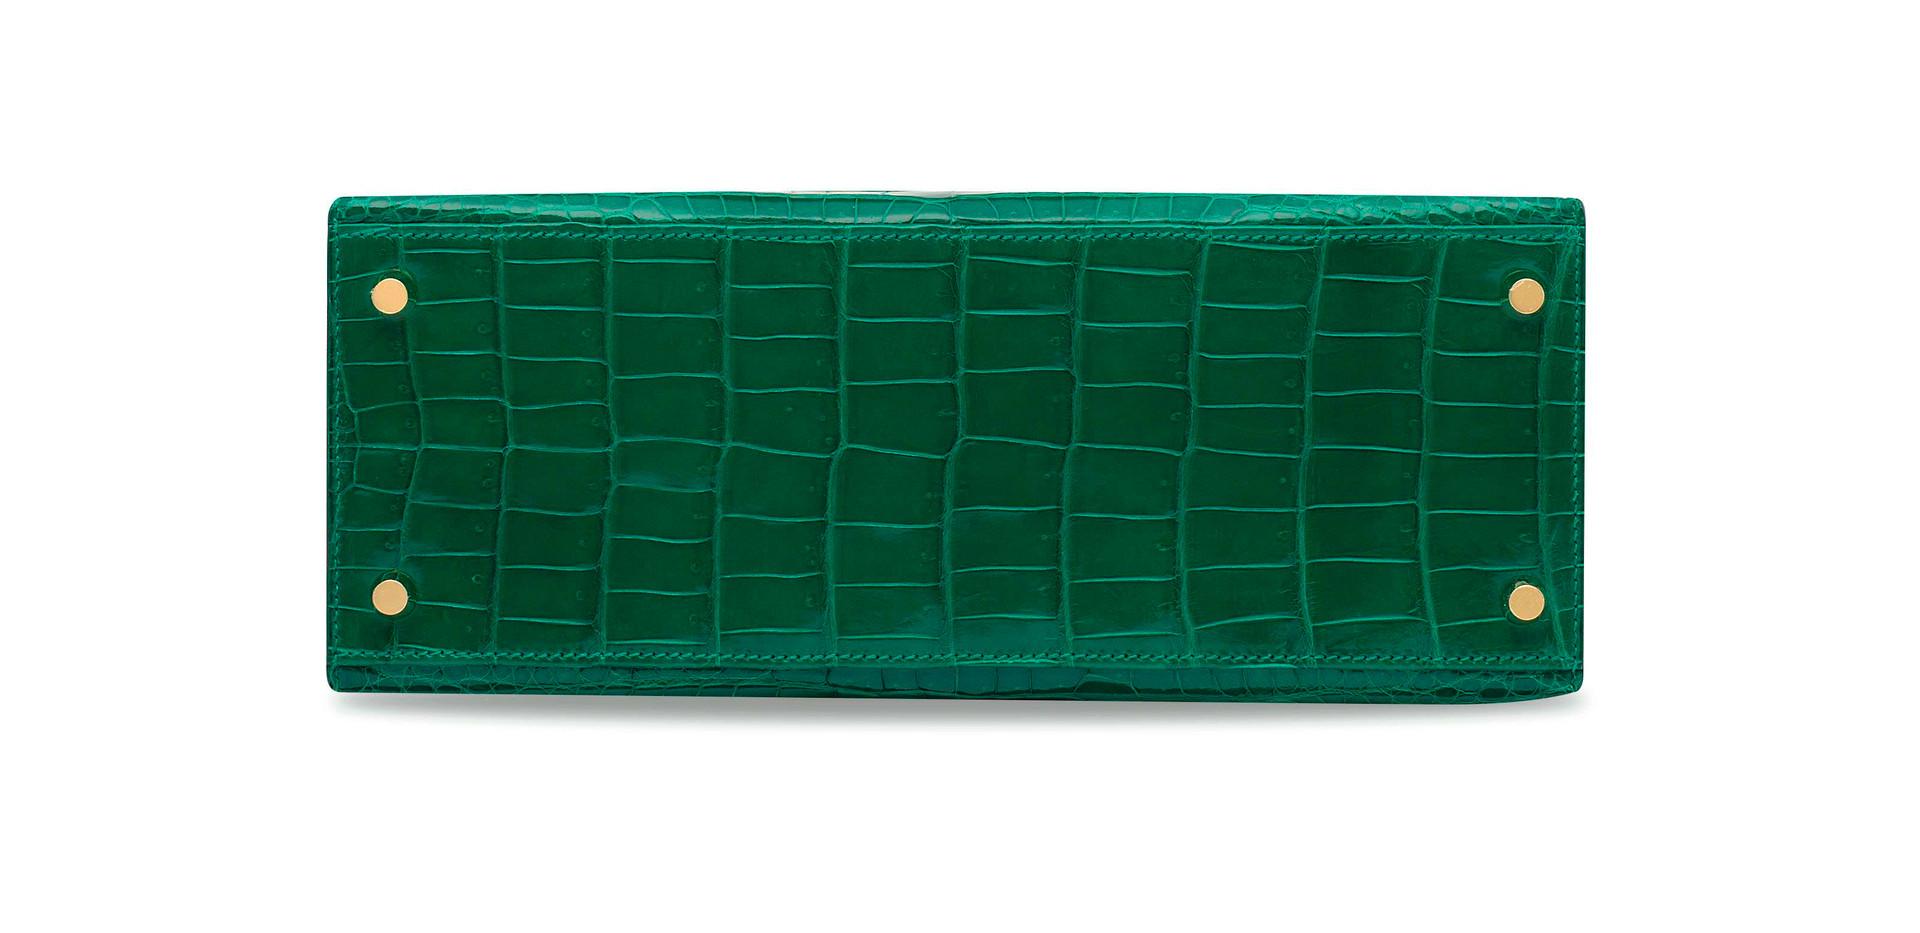 K28 emerald vert emeraude croco ghw (1).